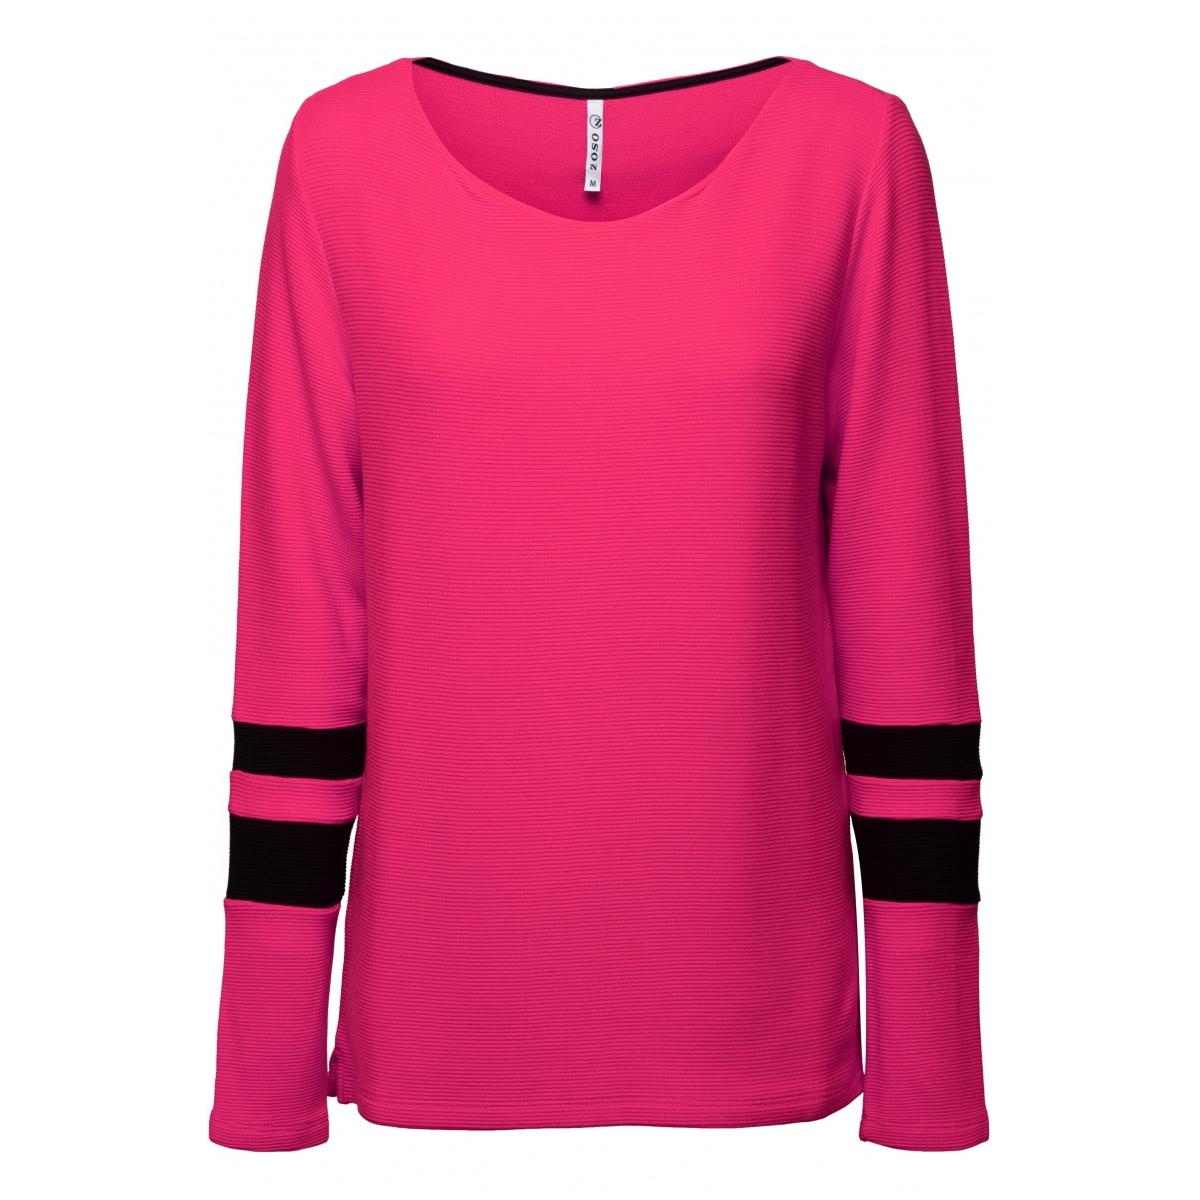 dory fantasy fabric sweater 194 zoso trui fushsia/black